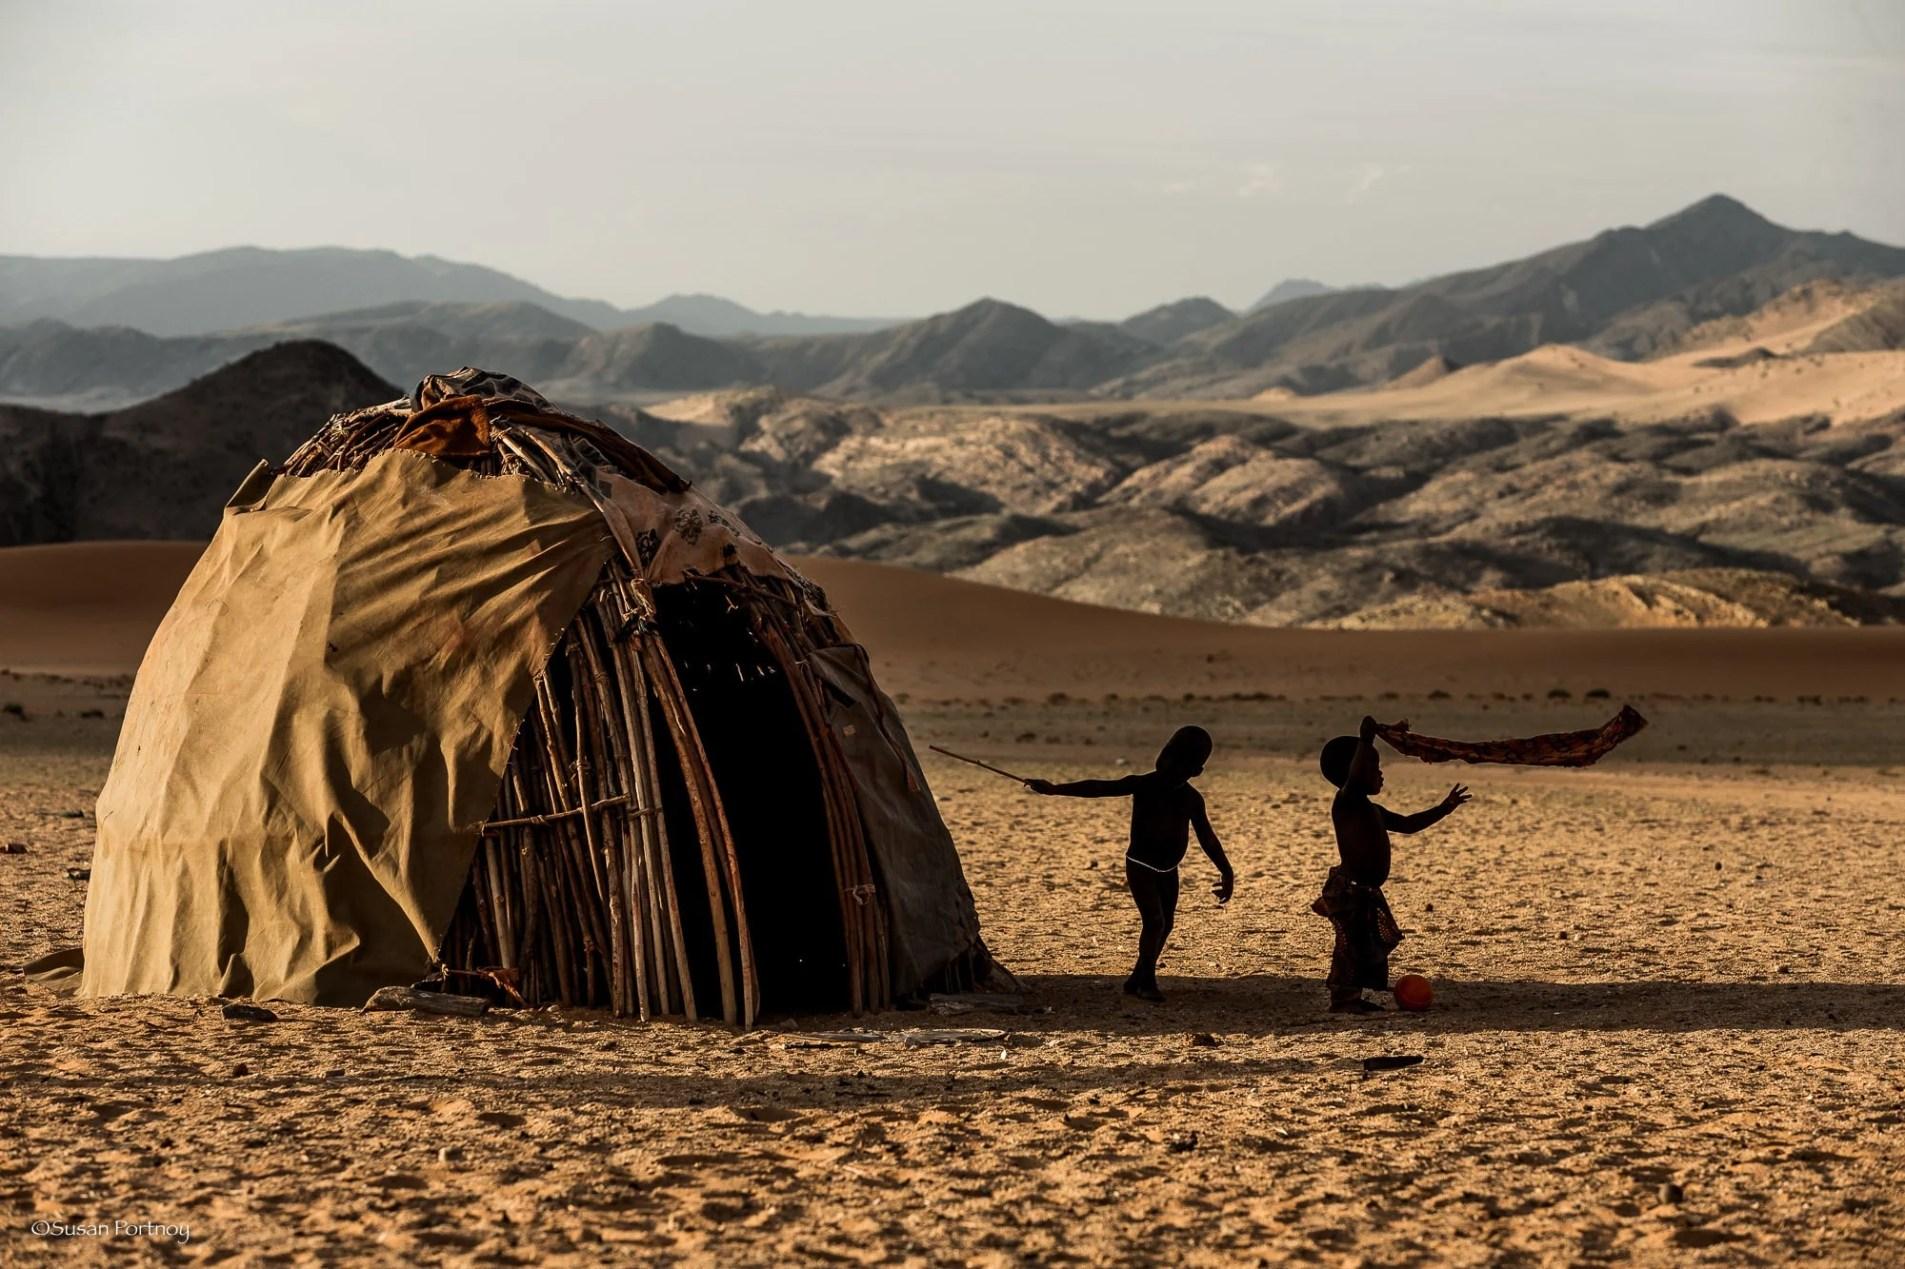 Himba children play in their village near Serra Cafema in Namibia